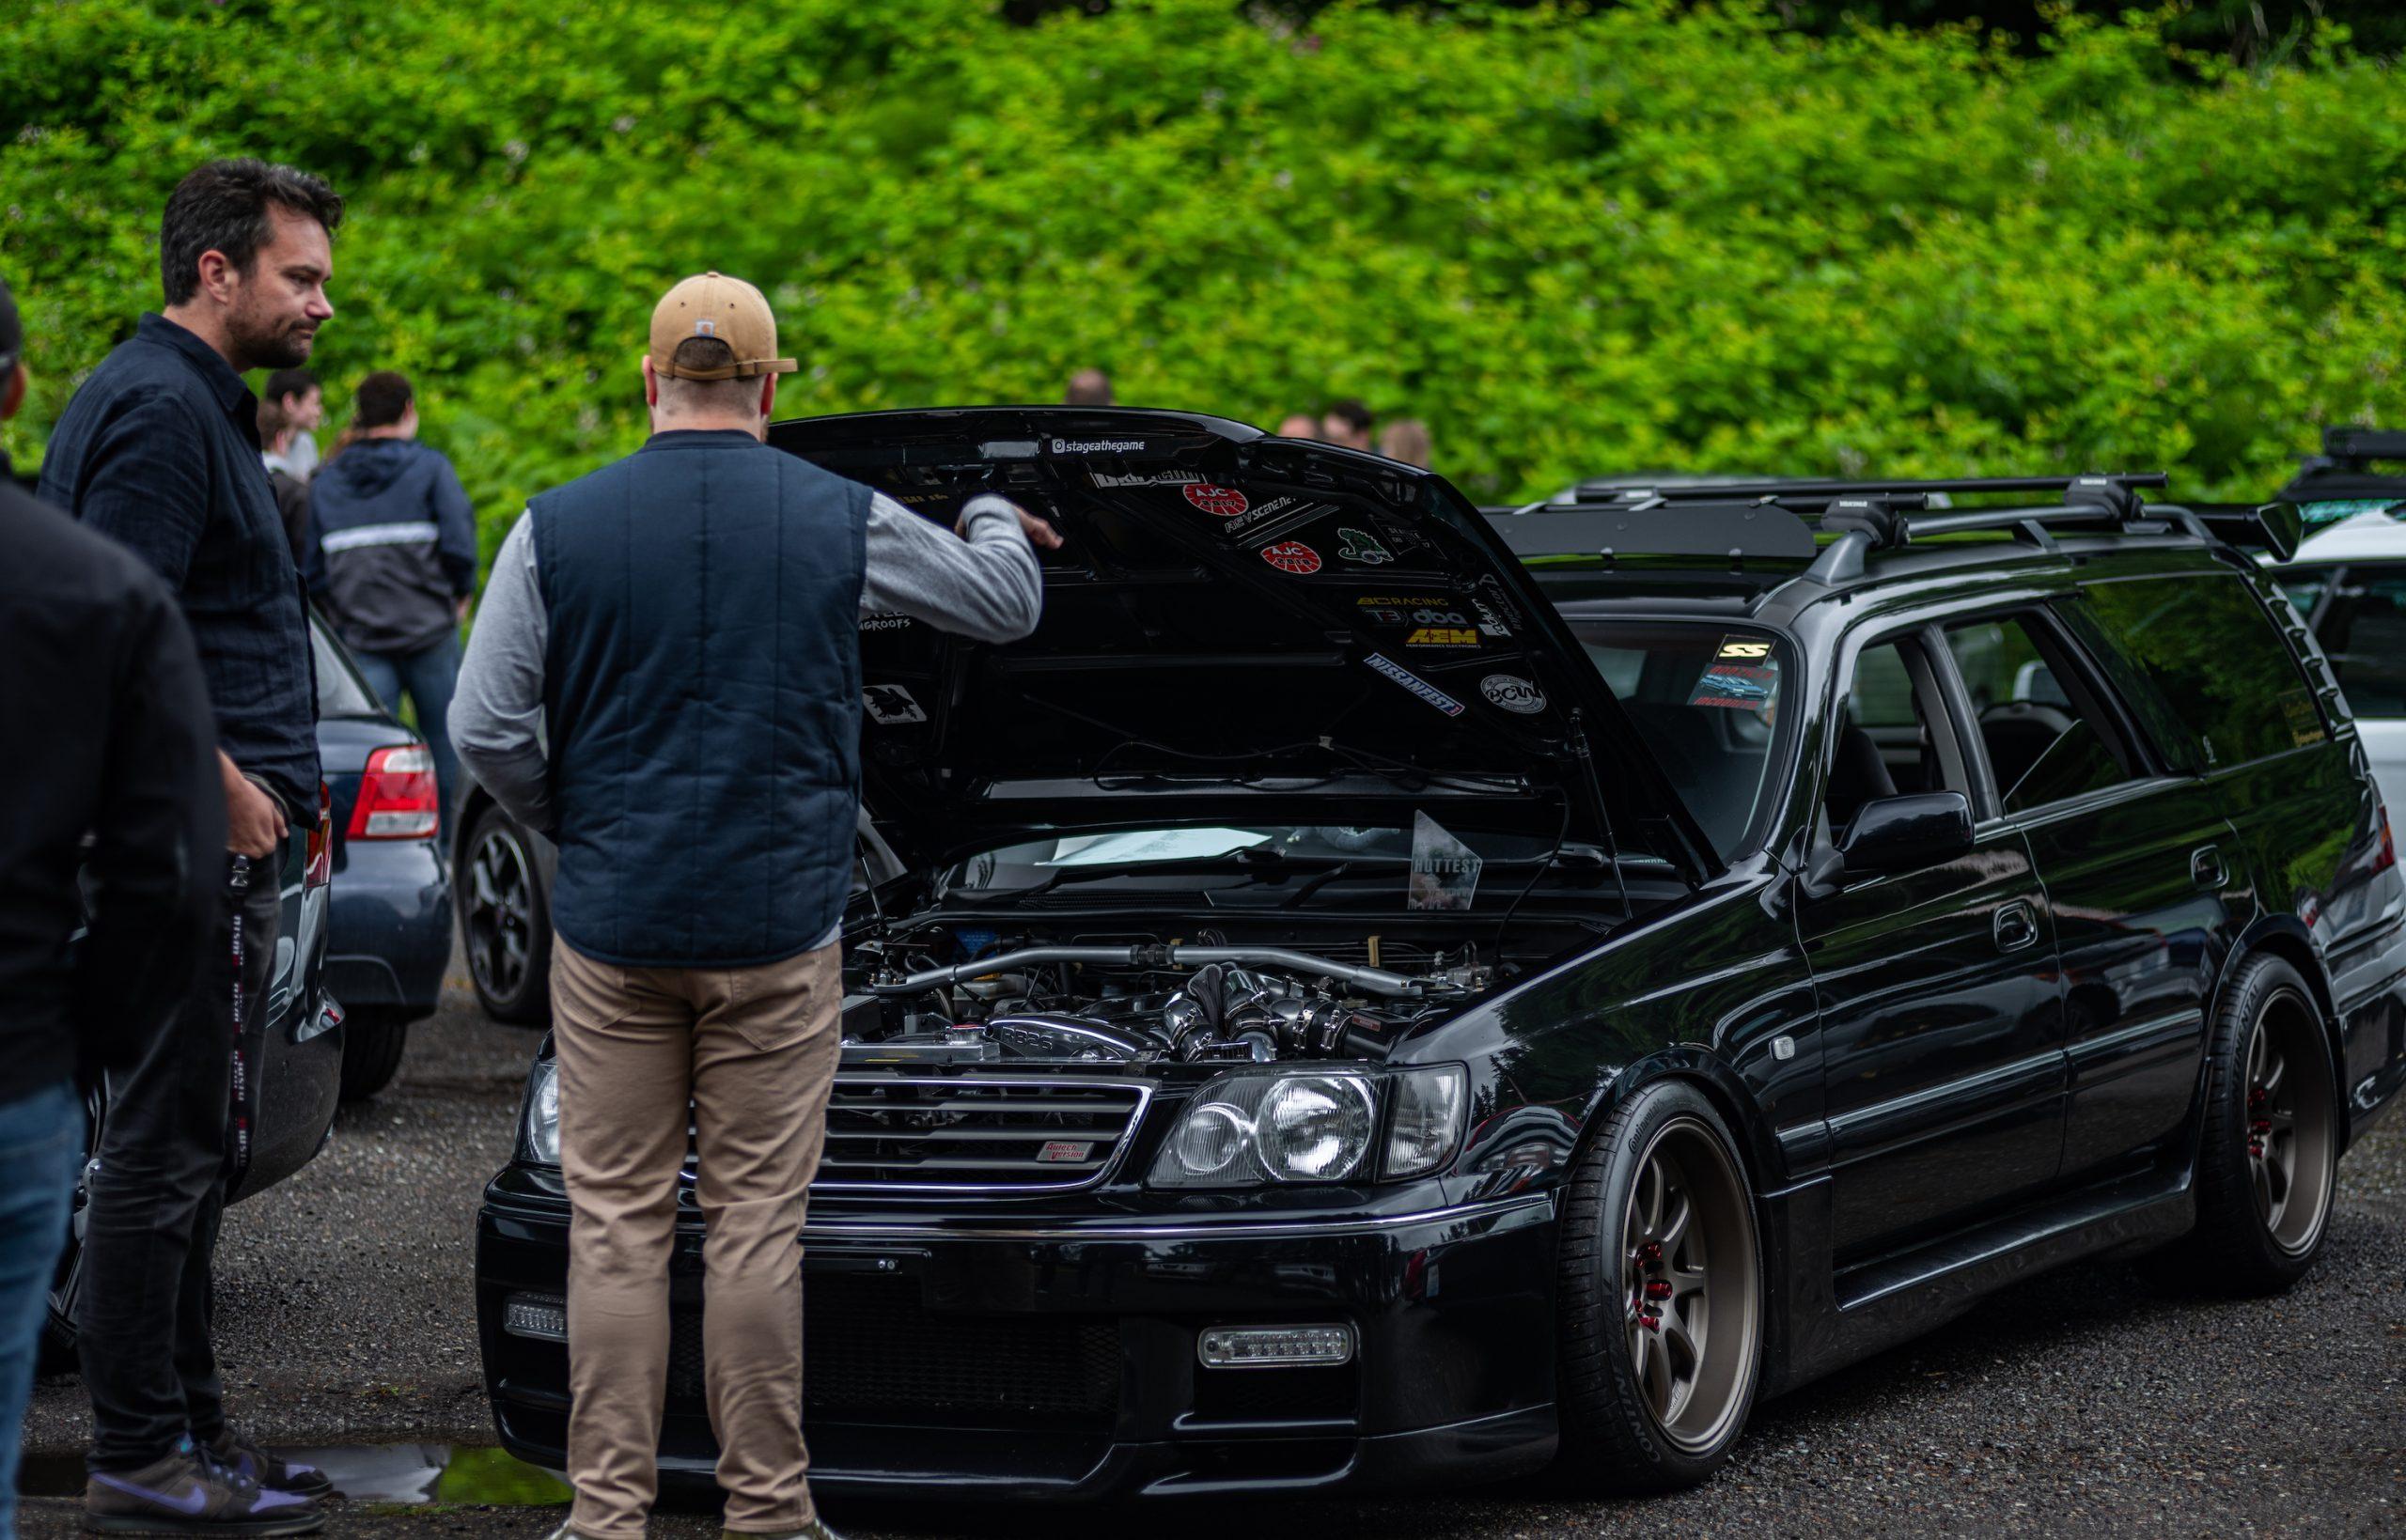 Men Talking Beside Tuner Wagon Engine Bay